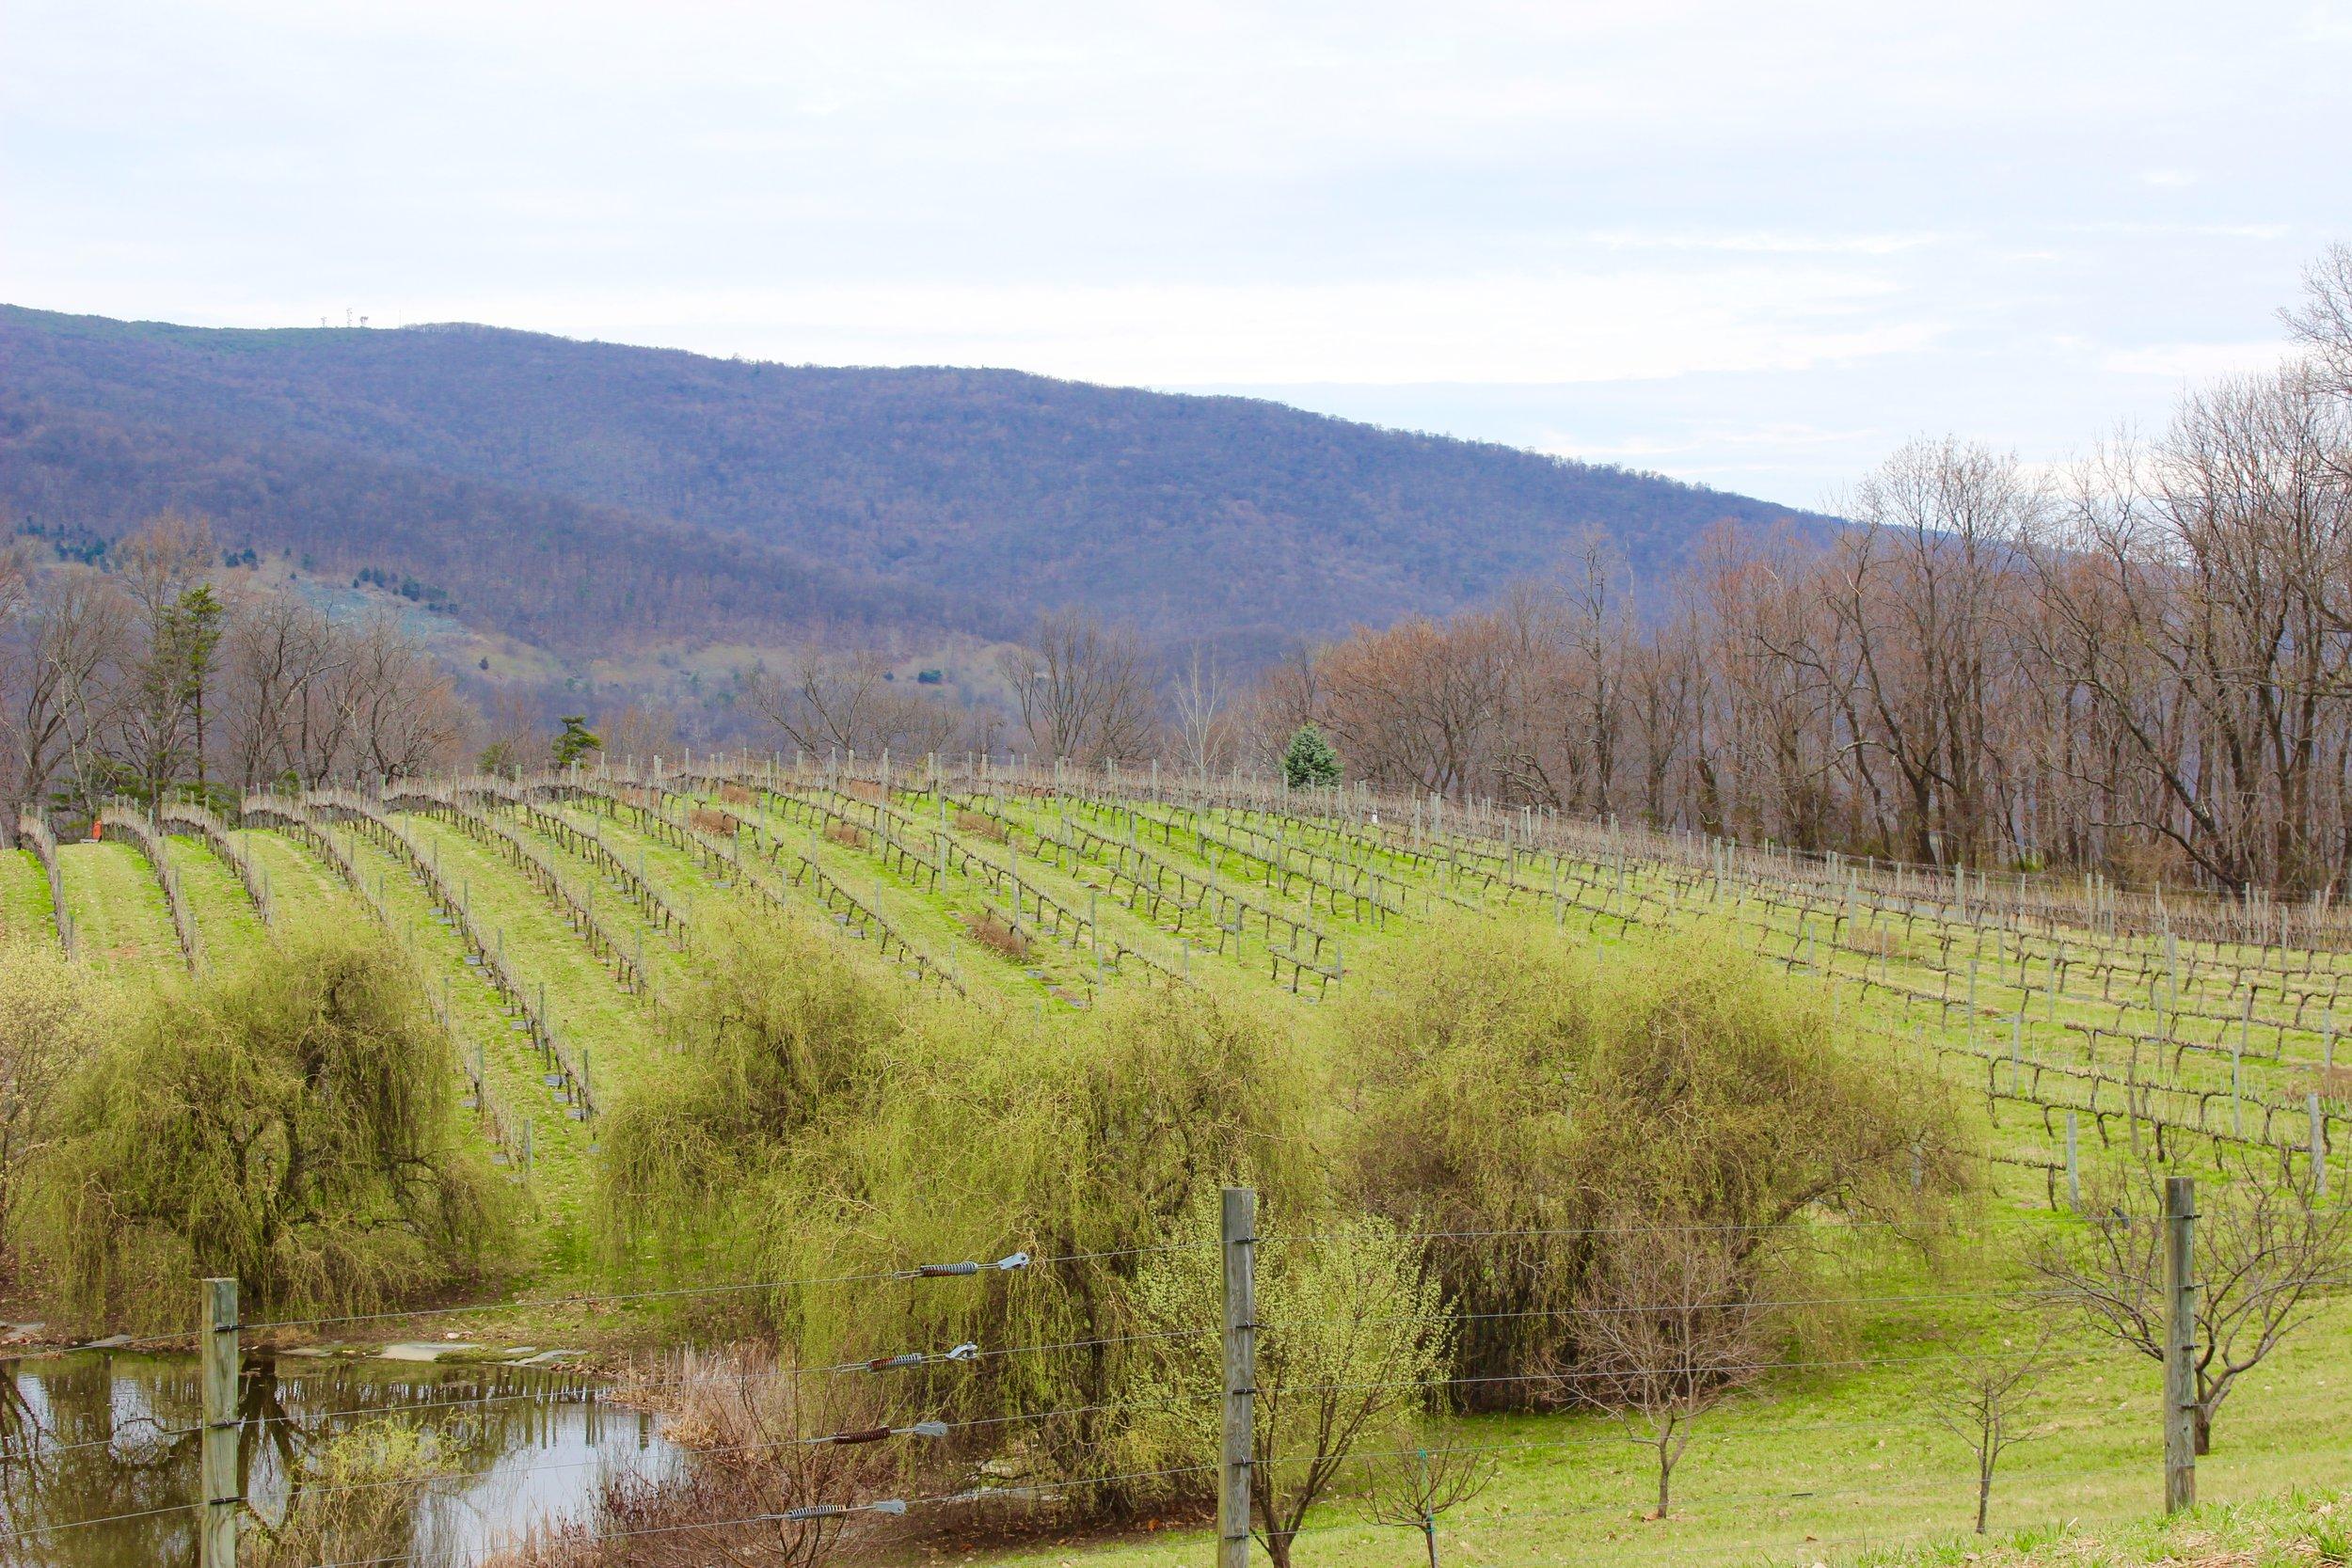 Turk Mountain Vineyards